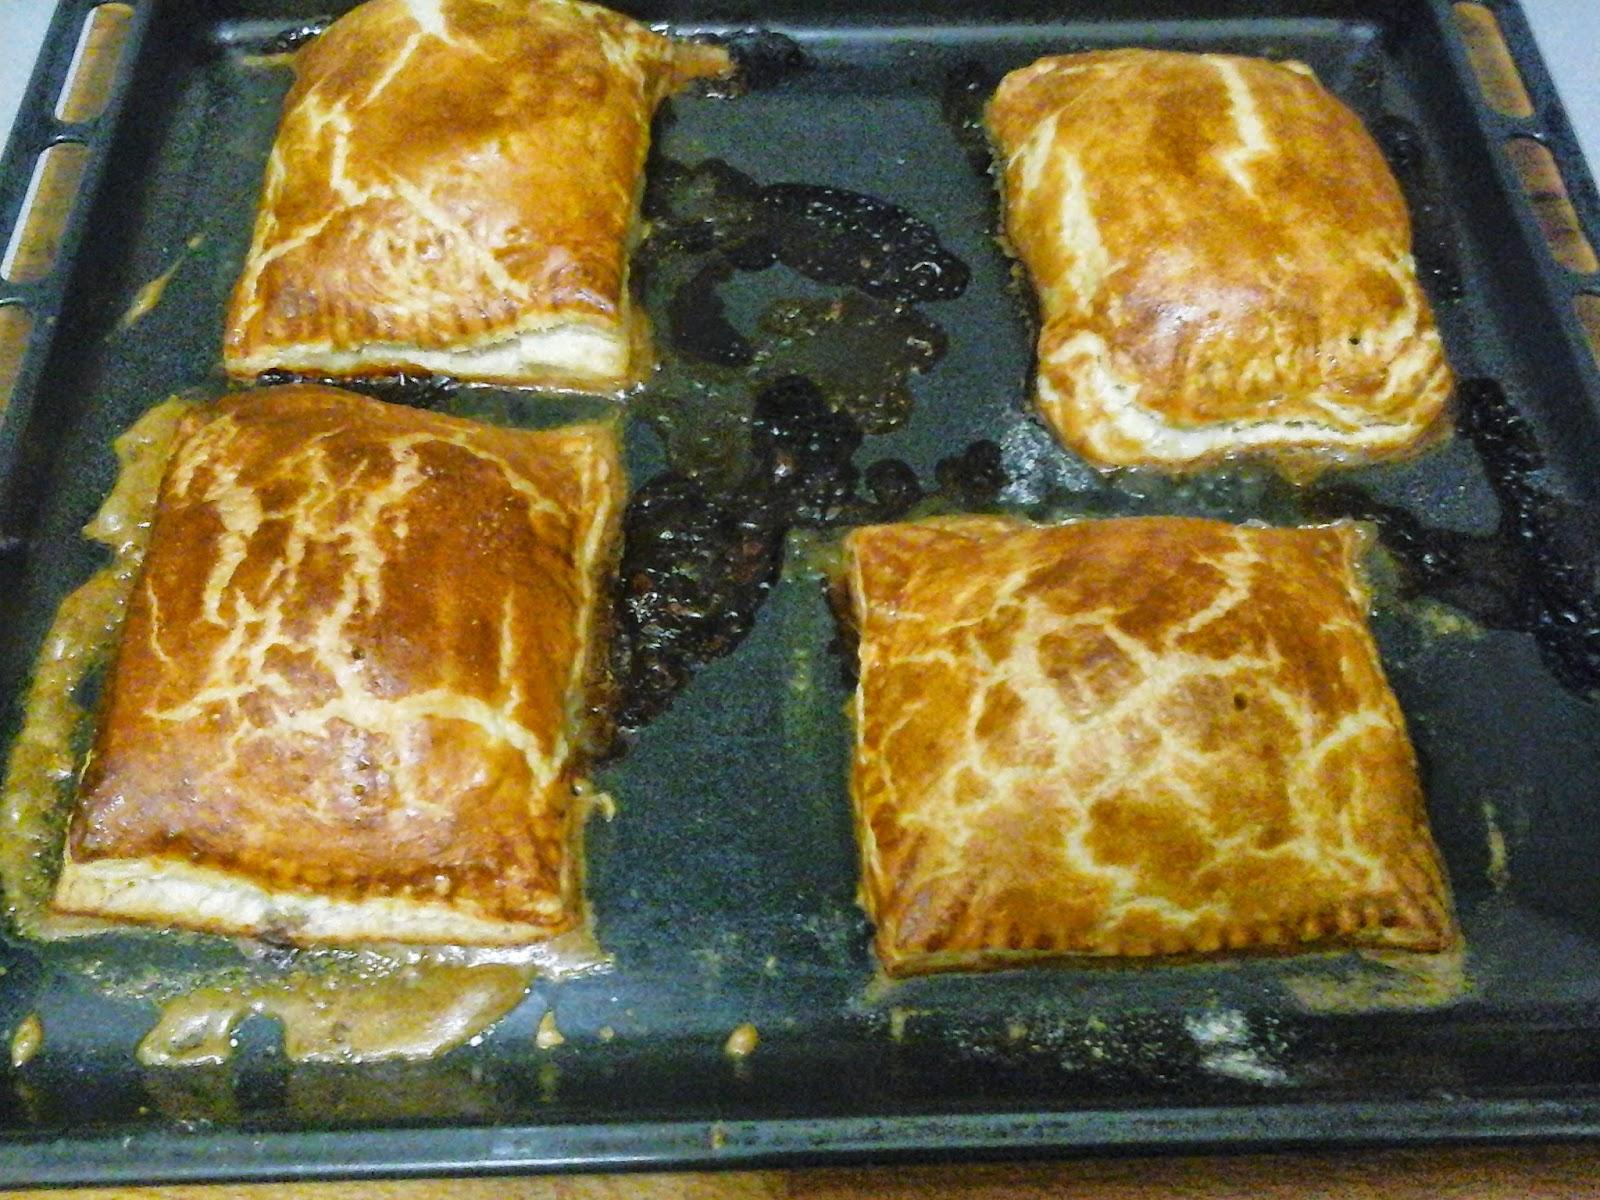 Escuela de cocina pako amor secreto ib rico con queso de - Escuela de cocina paco amor ...